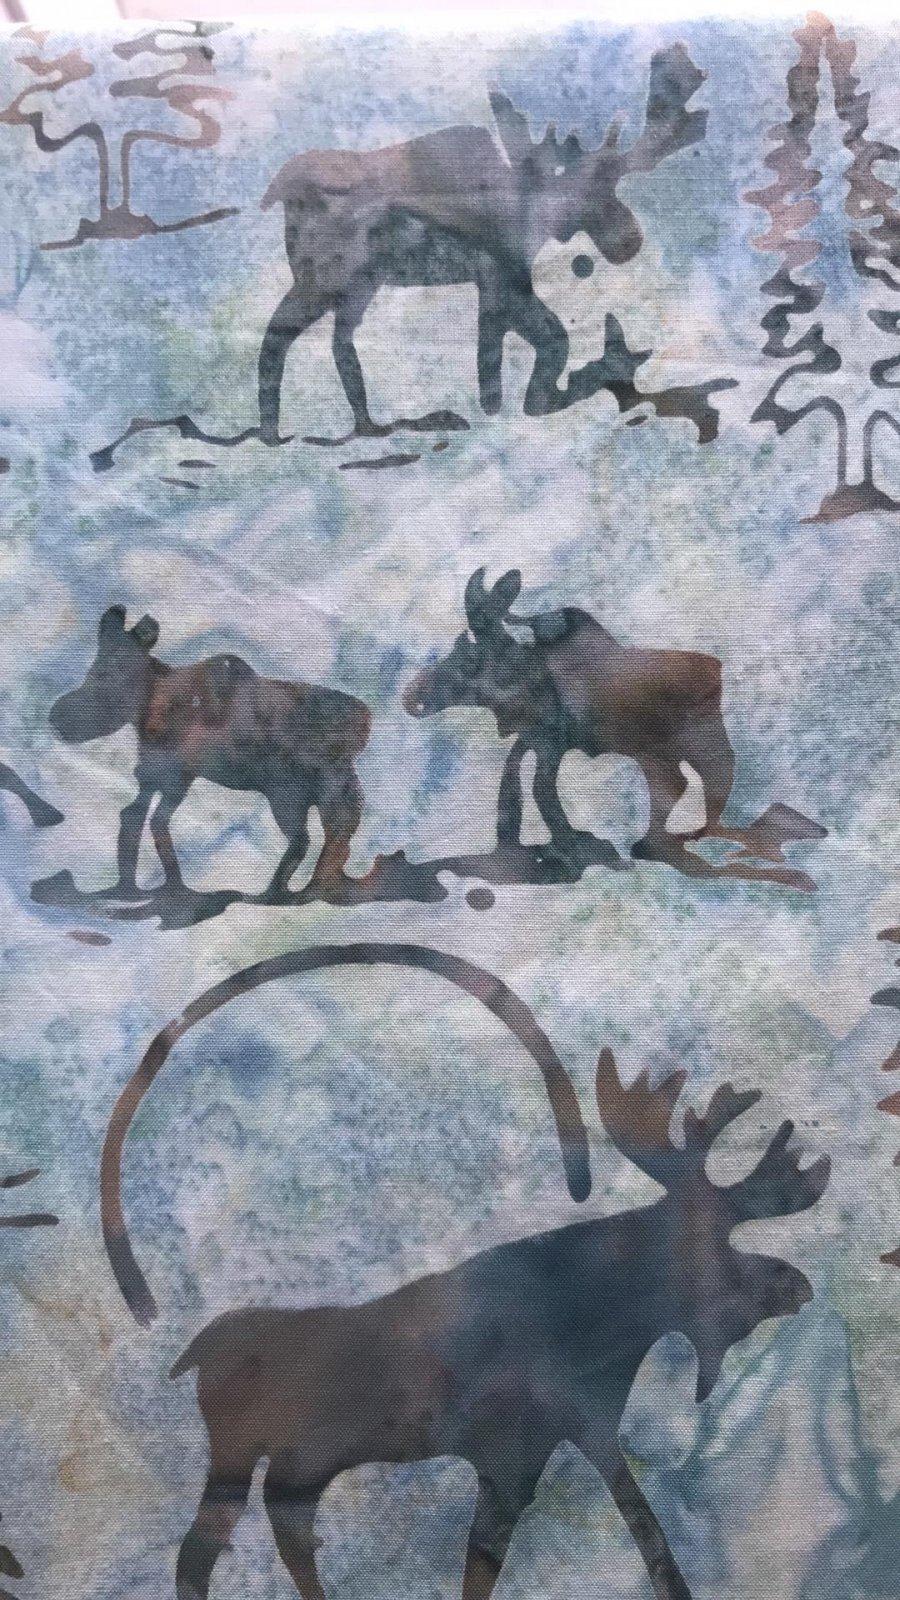 Cusom/Moose Green